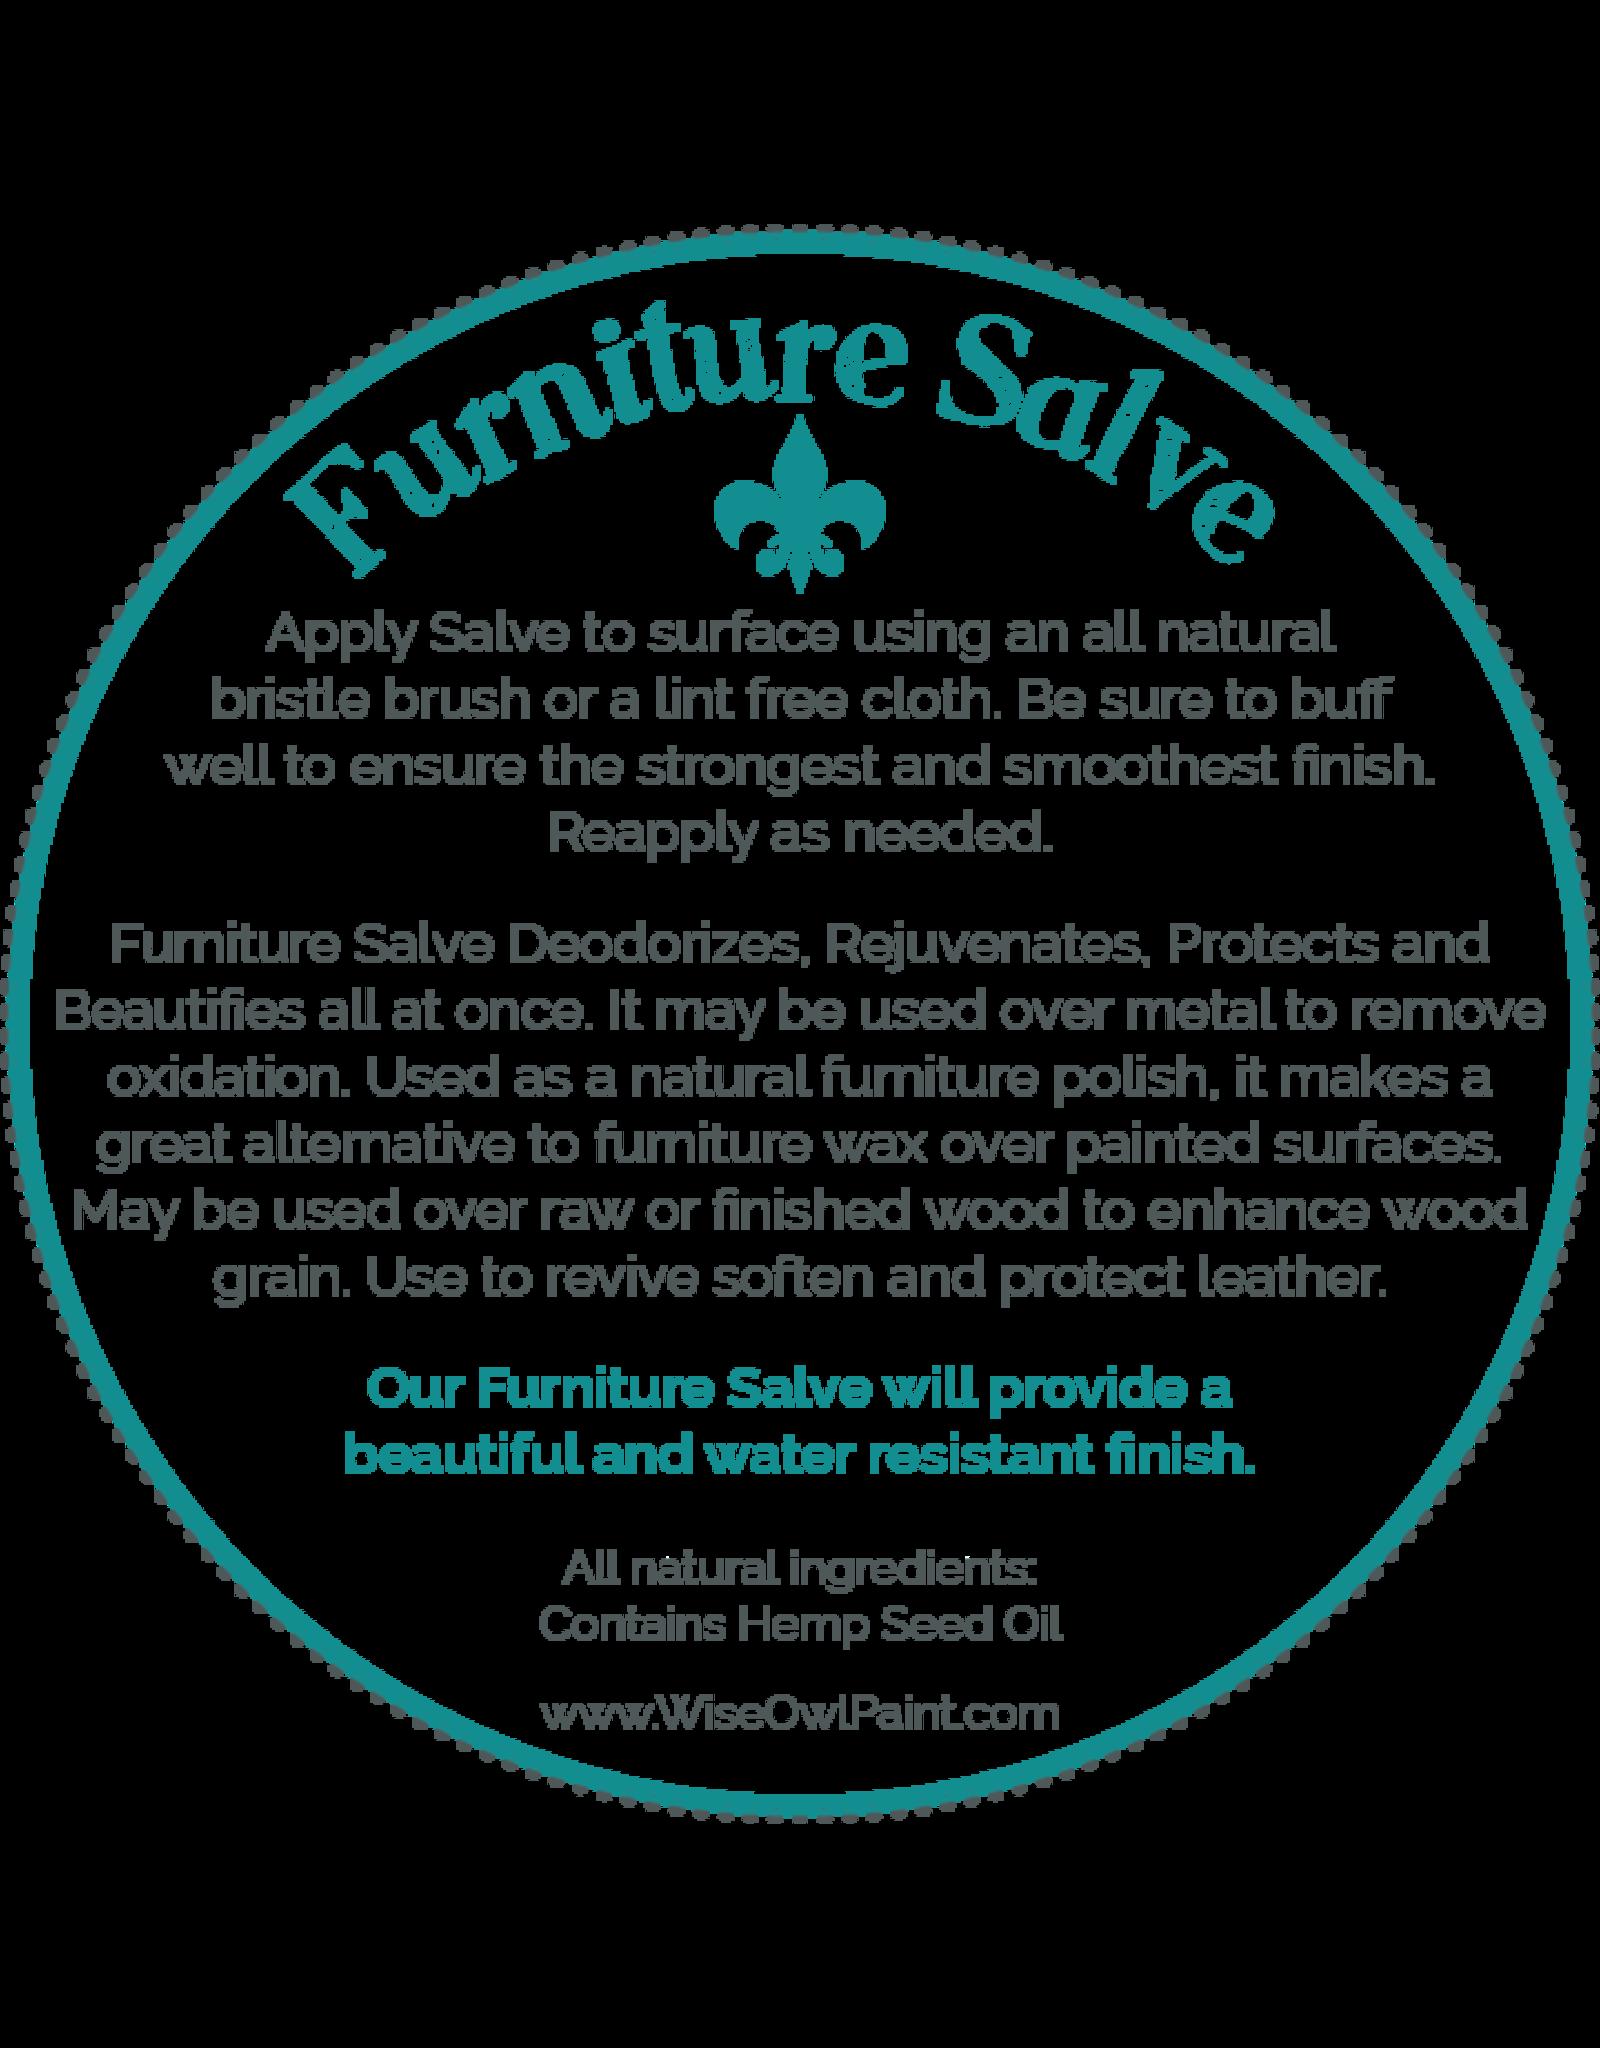 Wise Owl Paint Furniture Salve-Tobacco Flower 4oz